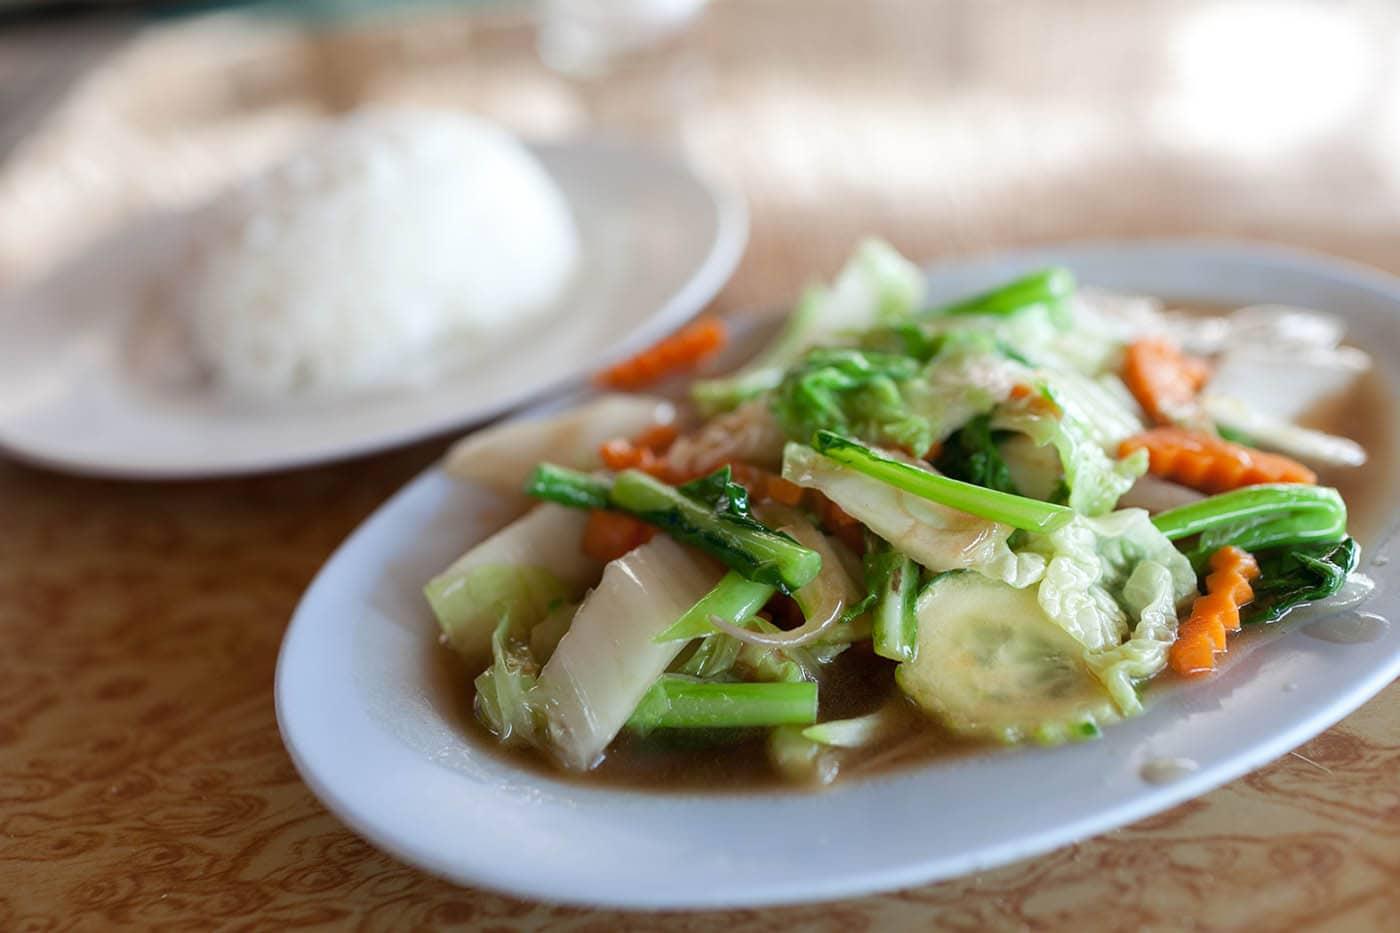 Vegetable stir fry at Huay Tung Tao Lake in Chiang Mai, Thailand.